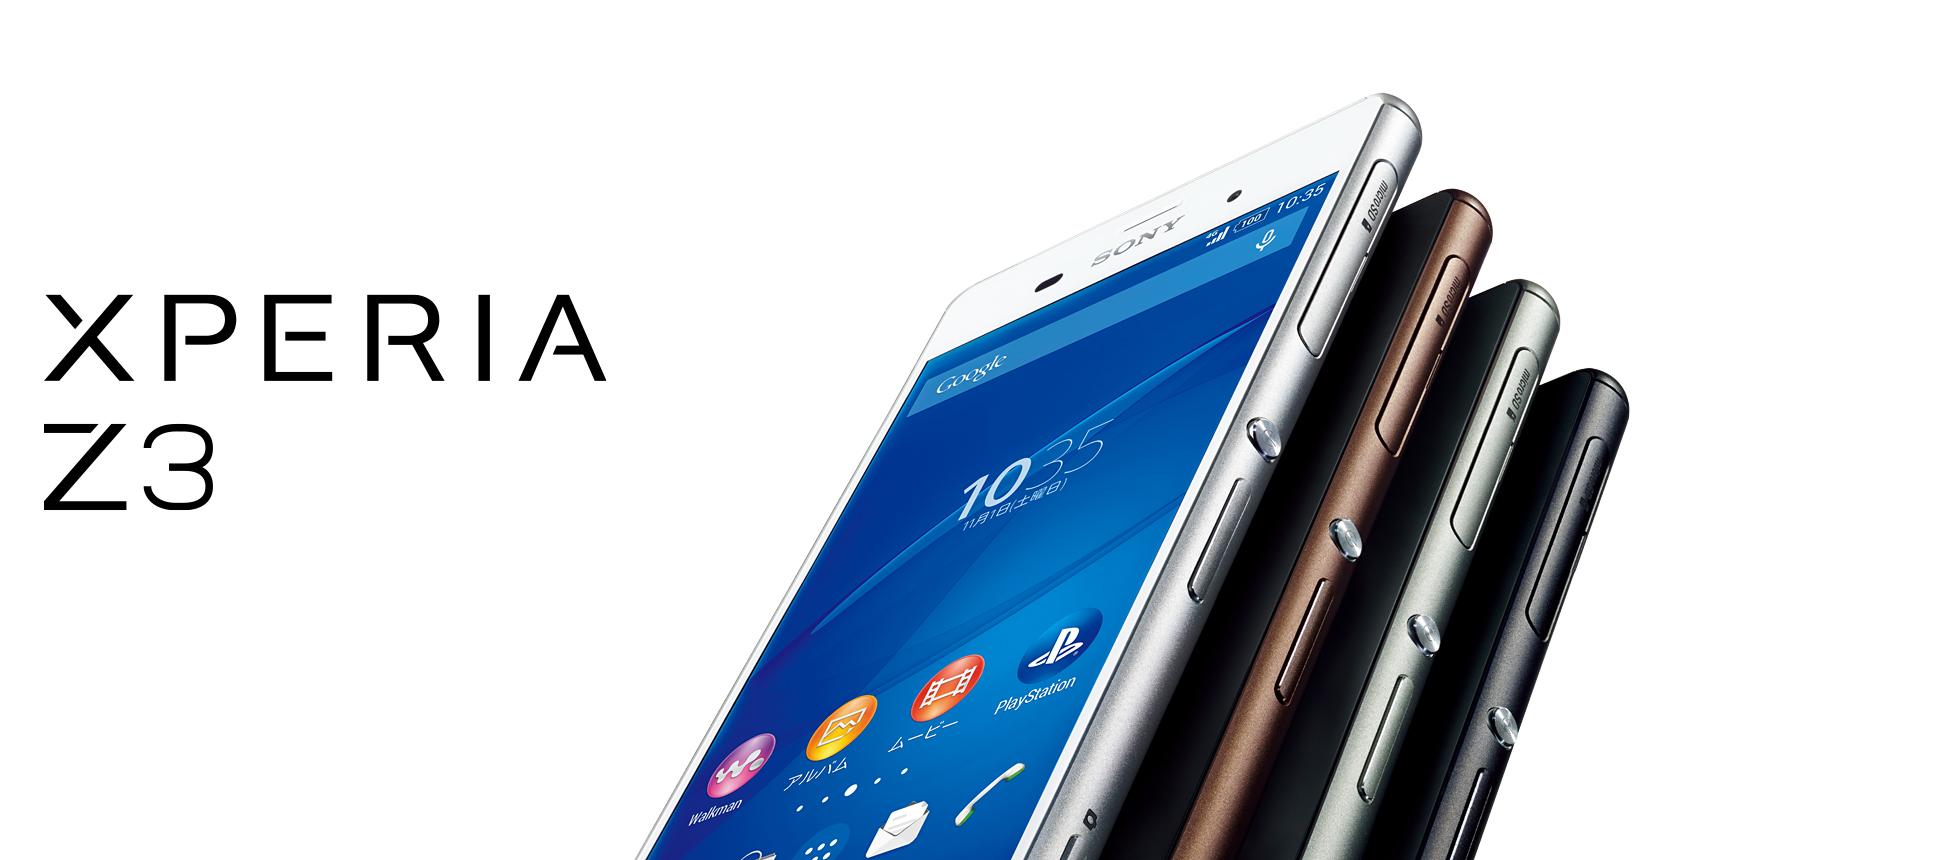 XperiaZ3 のスペックや特徴、買取価格まとめ【買取クイック】